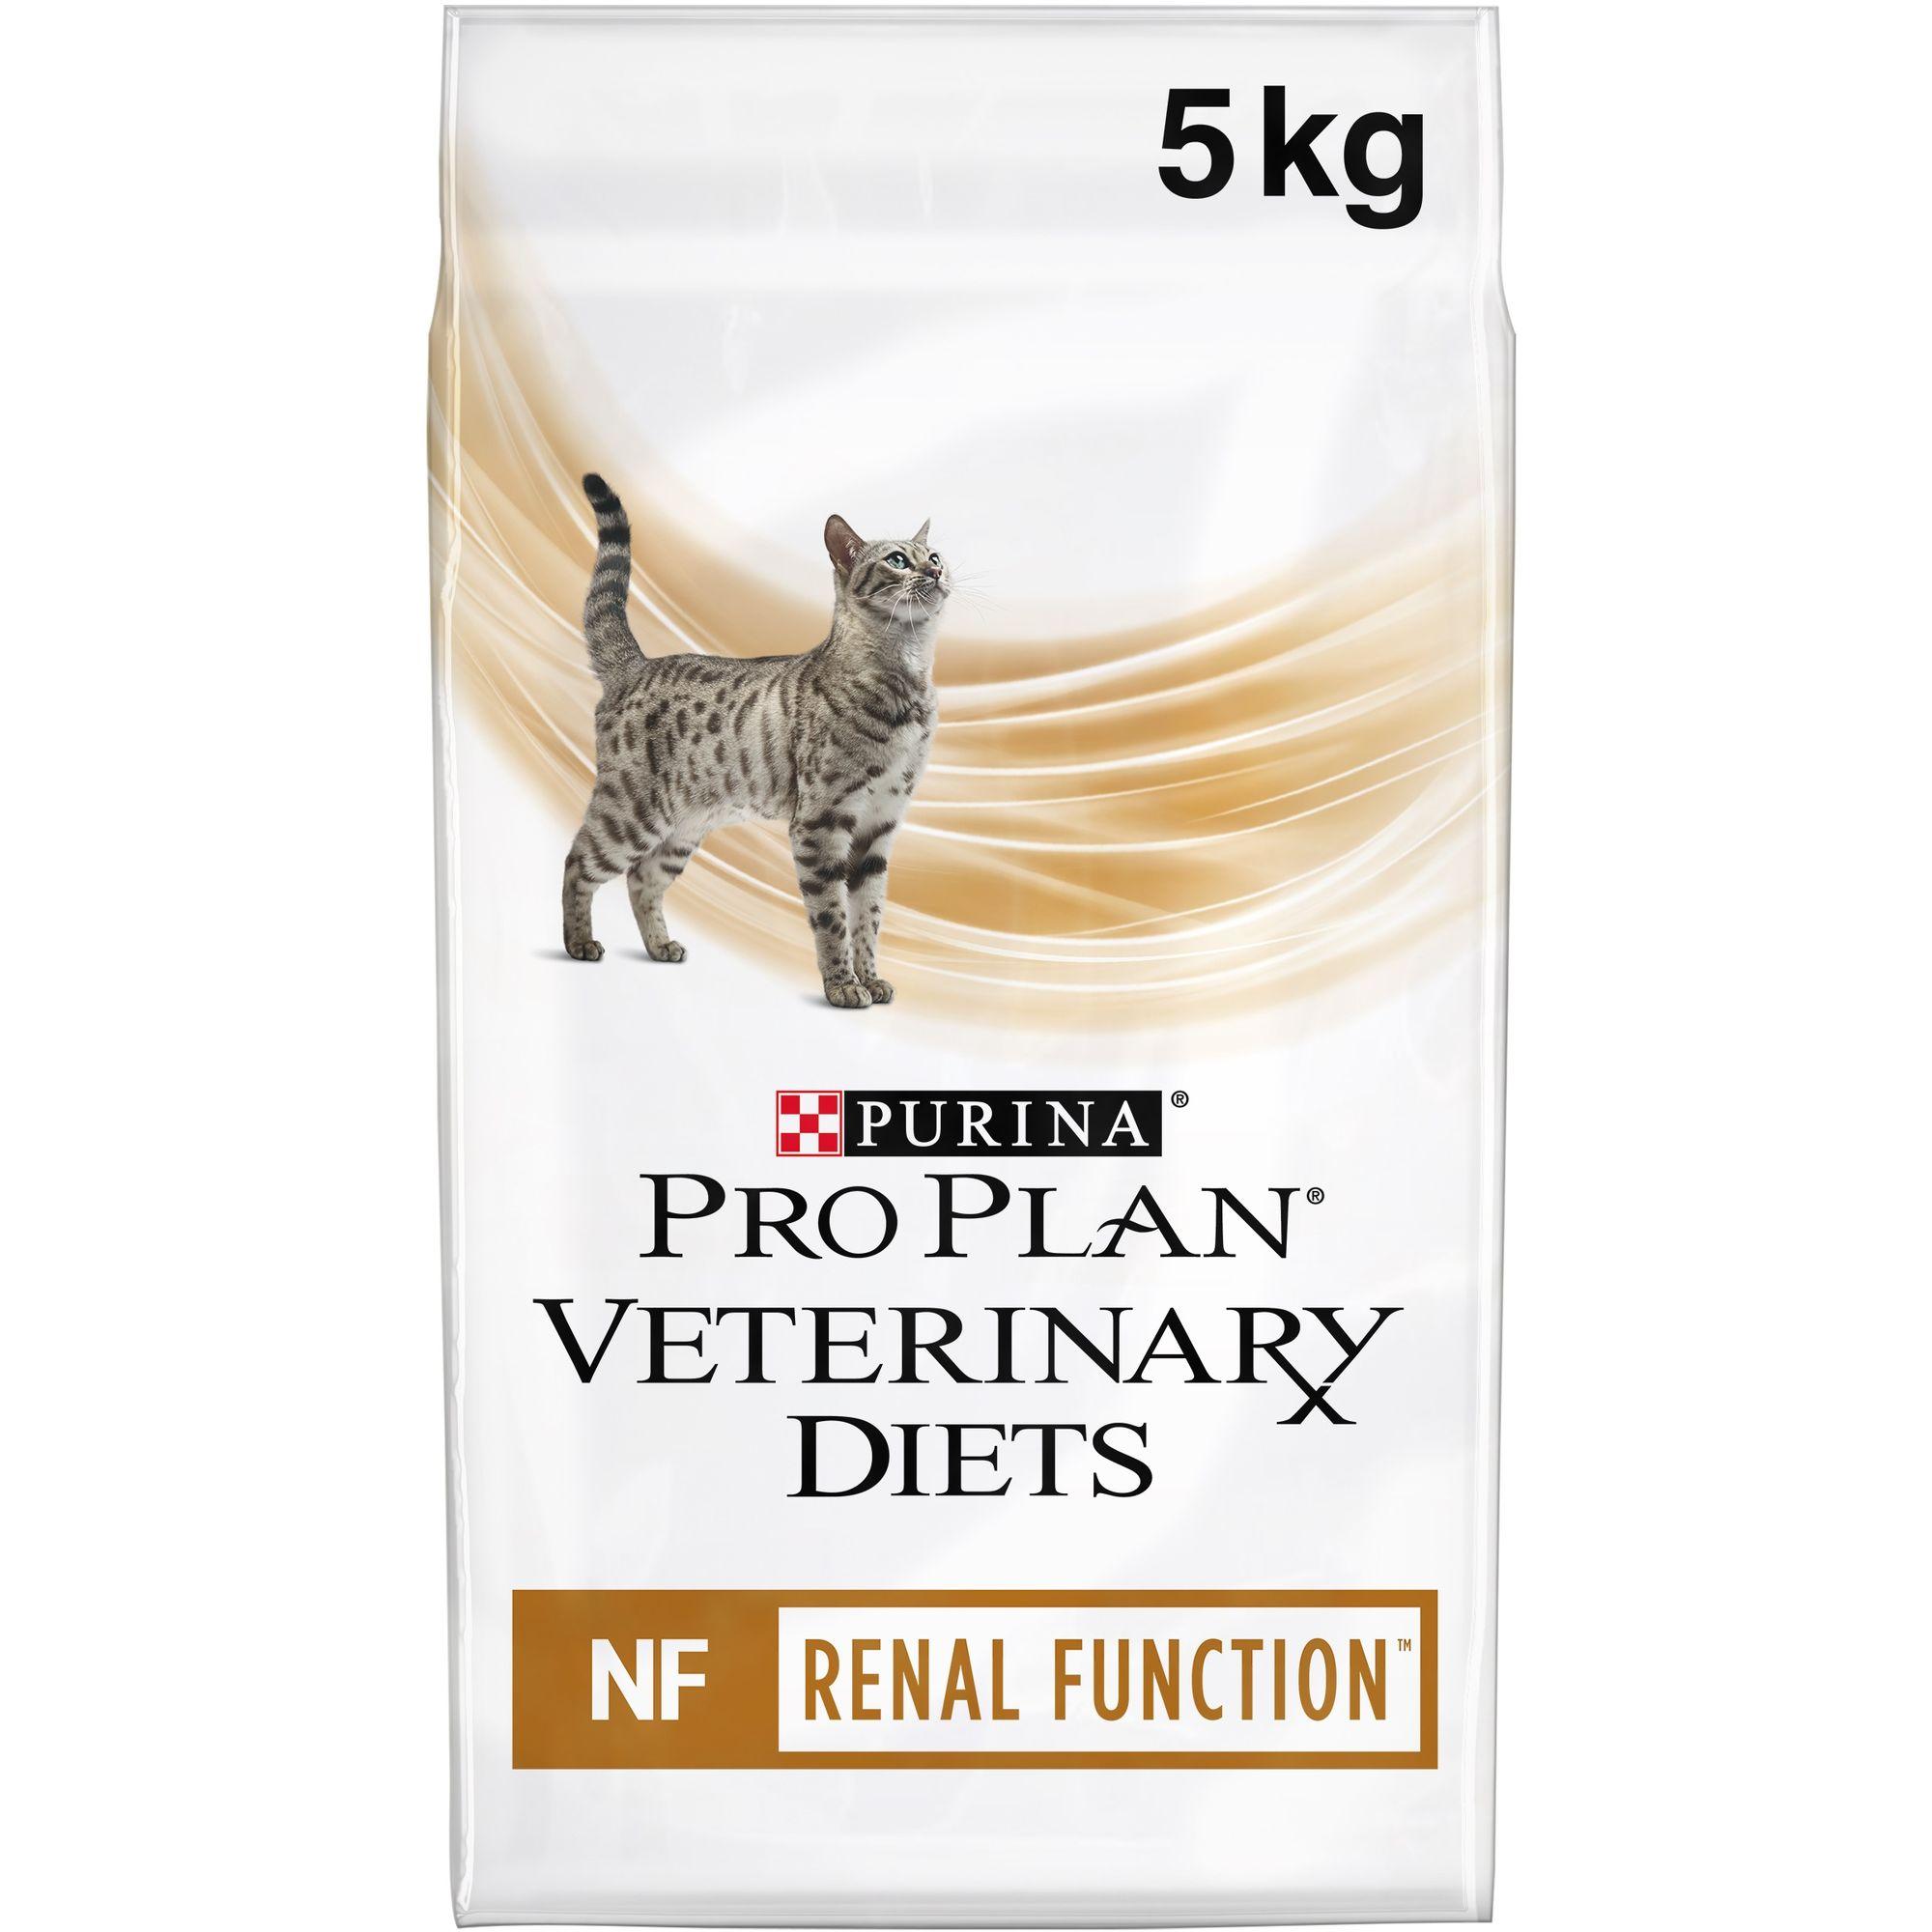 Purina Pro Plan Veterinary Diets Feline NF Renal Function Kattenvoer